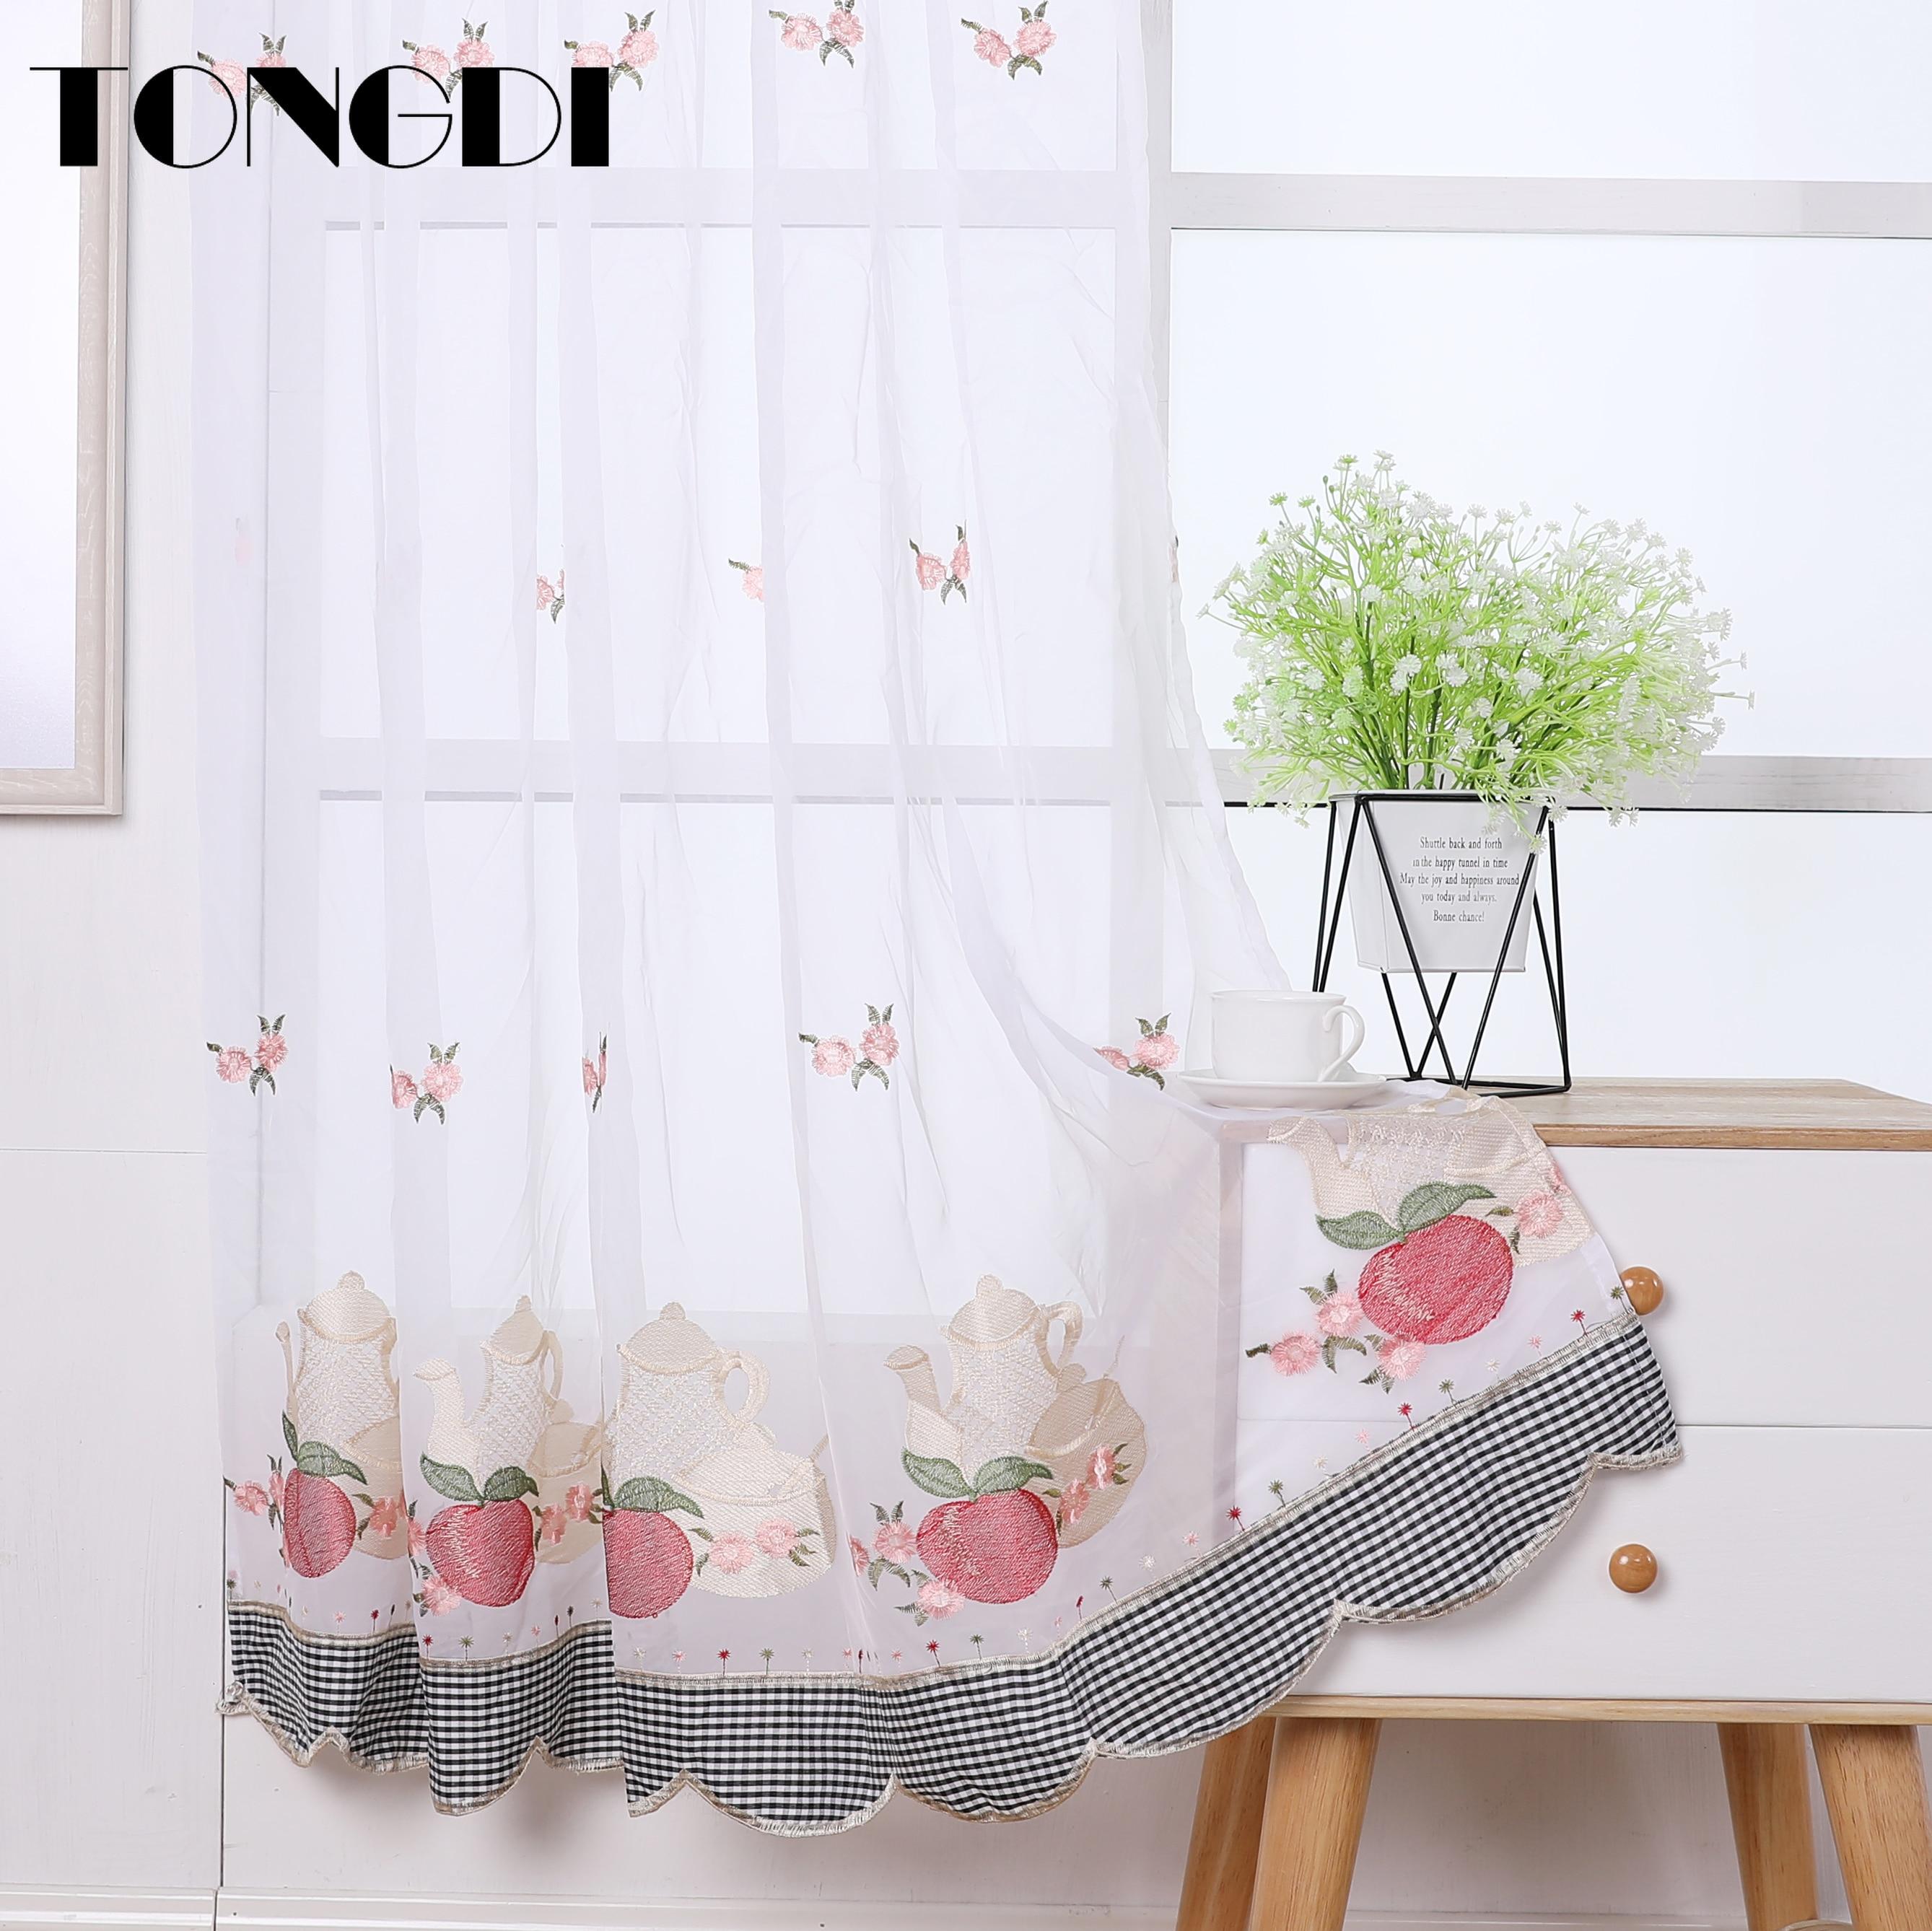 TONGDI, cortina de cocina, cenefa escarpada, cortina Pastoral de tul de frutas para café, hermoso bordado para ventana de cocina, comedor